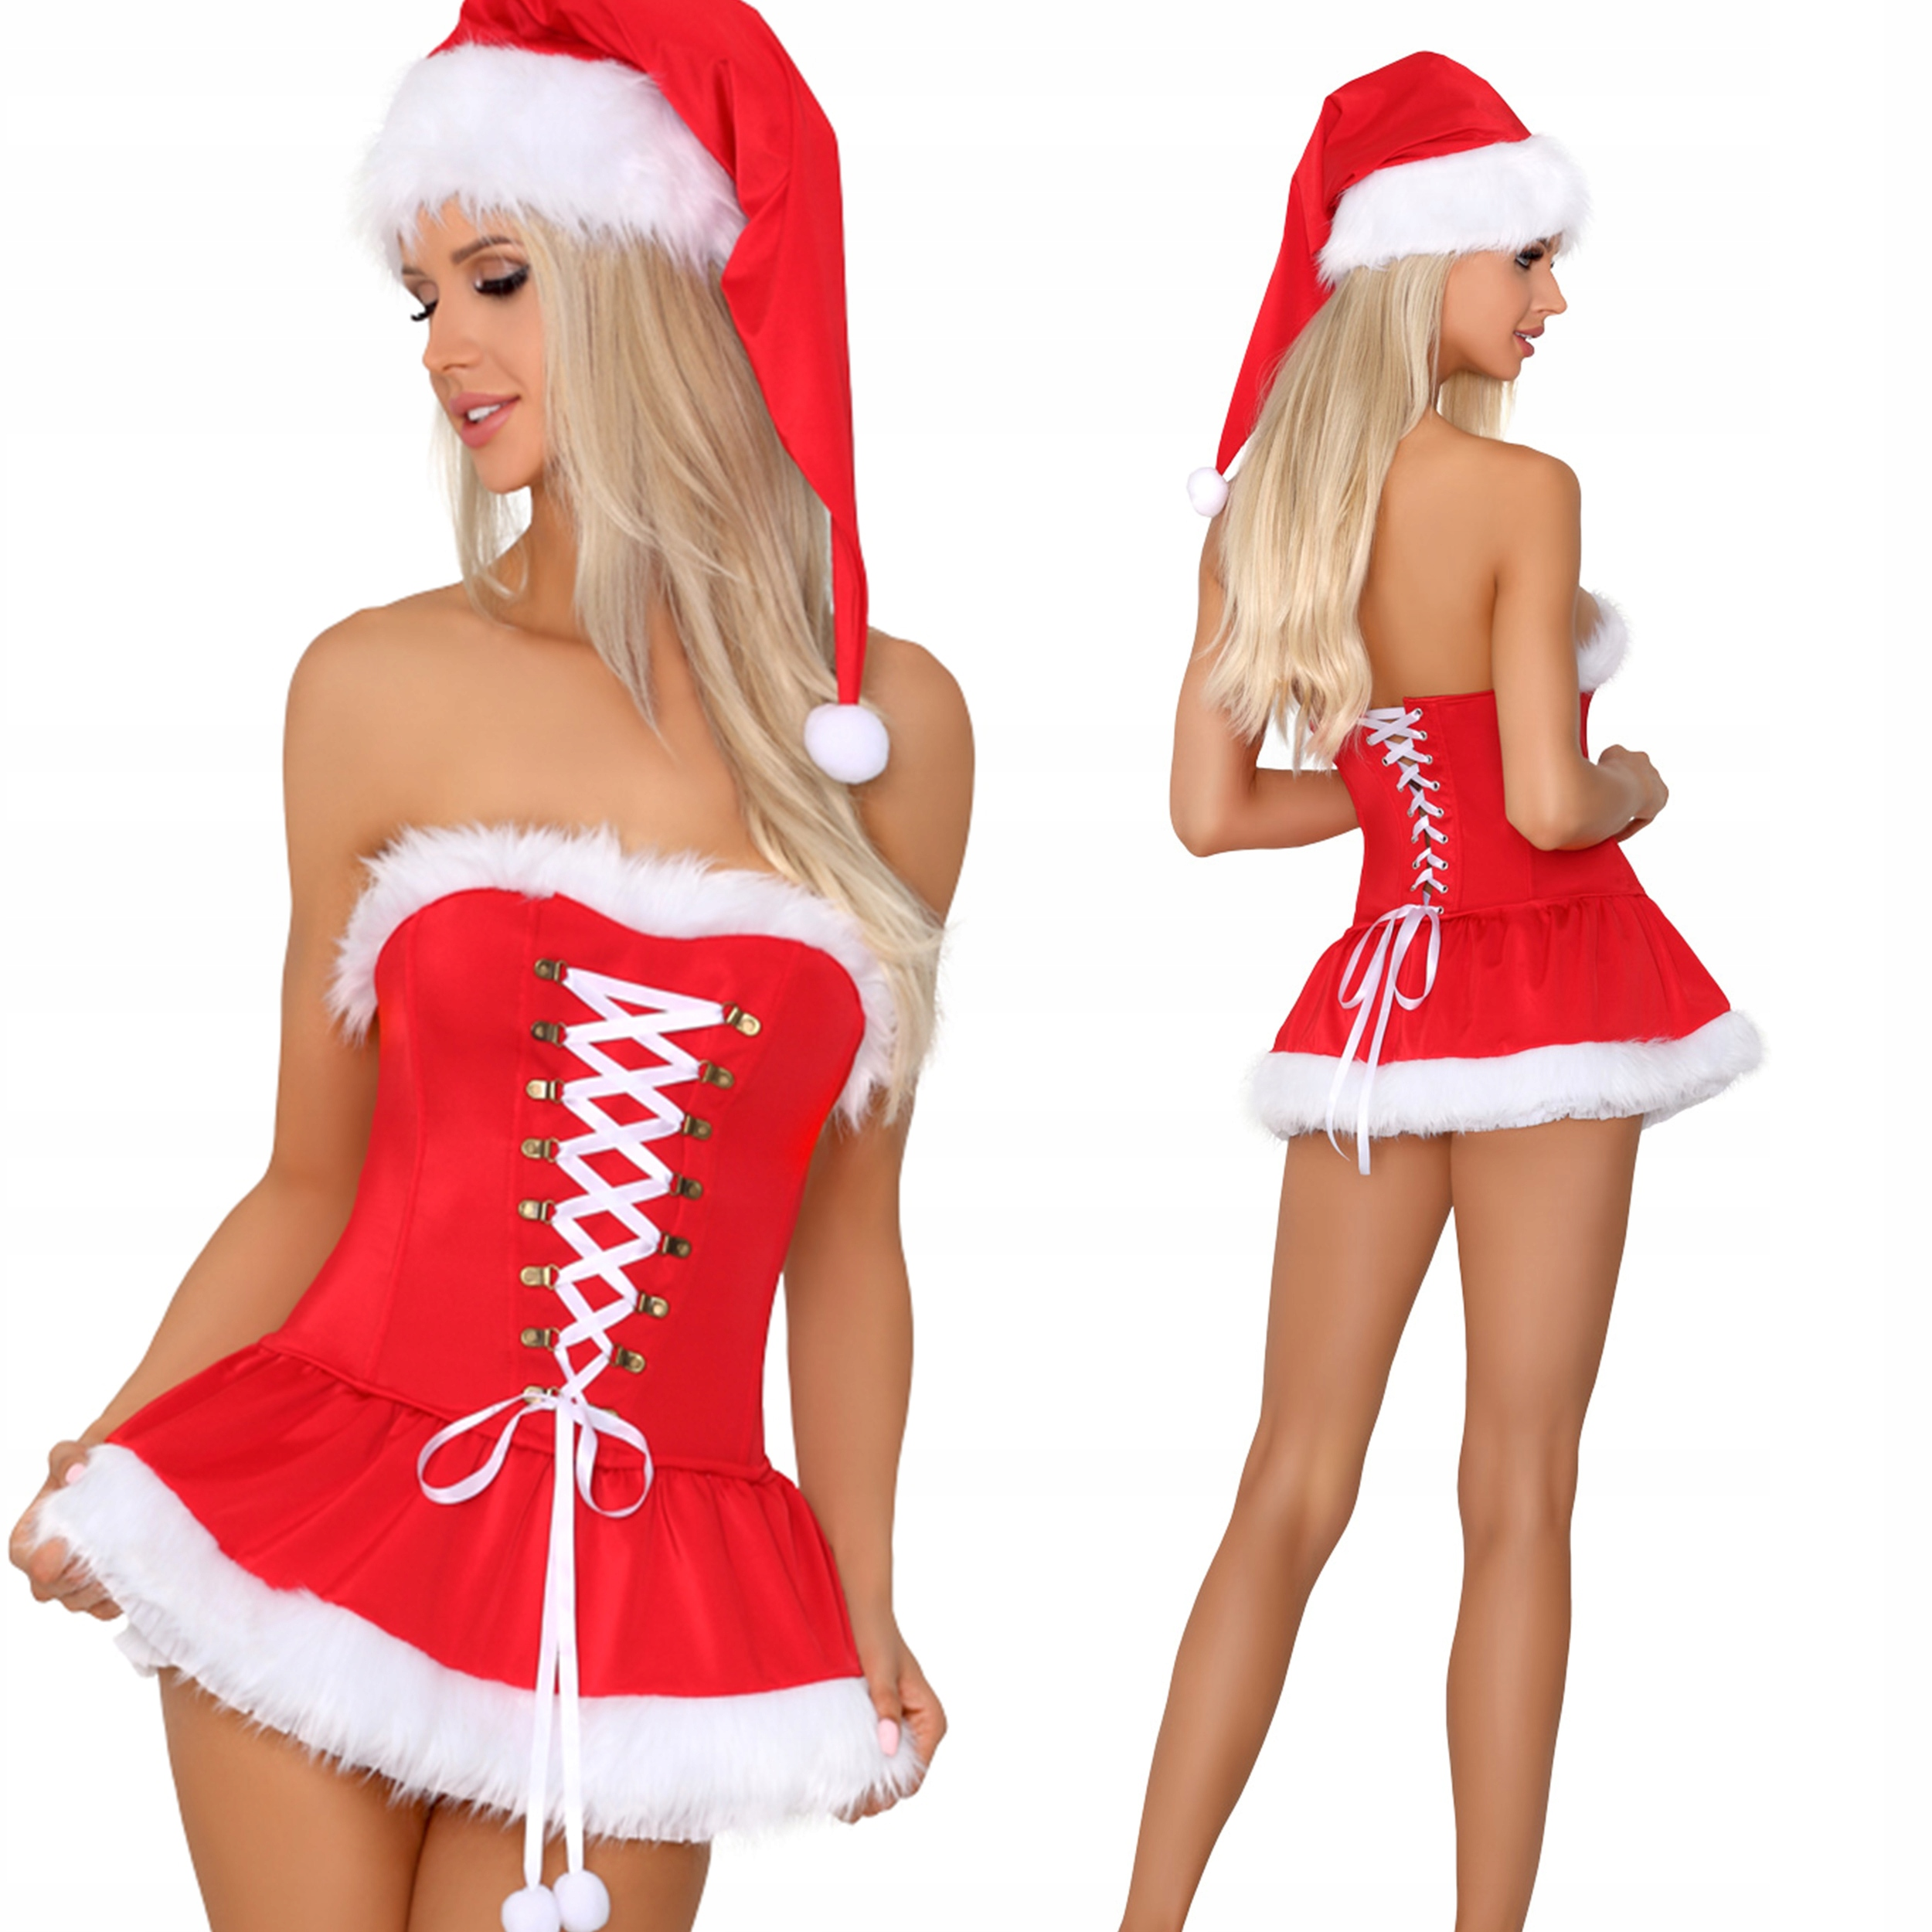 Наряд Деда Мороза наряд Снежинка костюм S / M